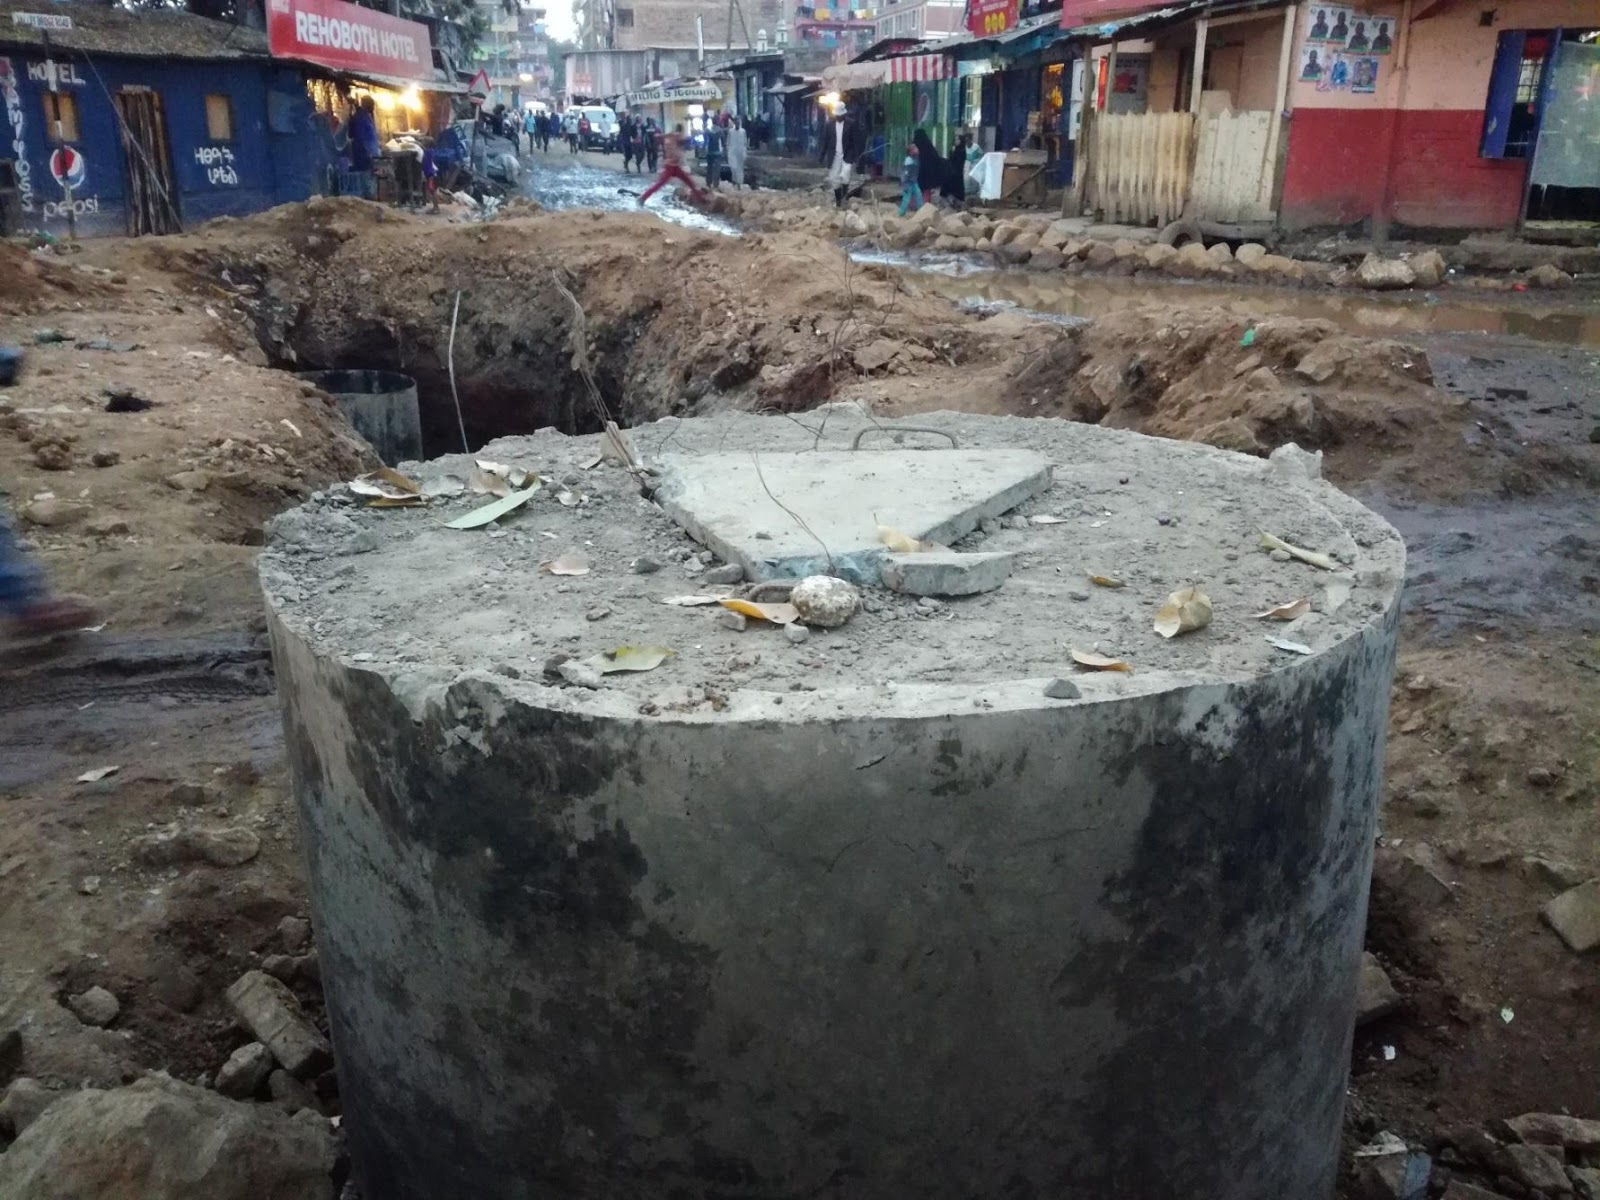 Kiamaiko sewer rehabilitation